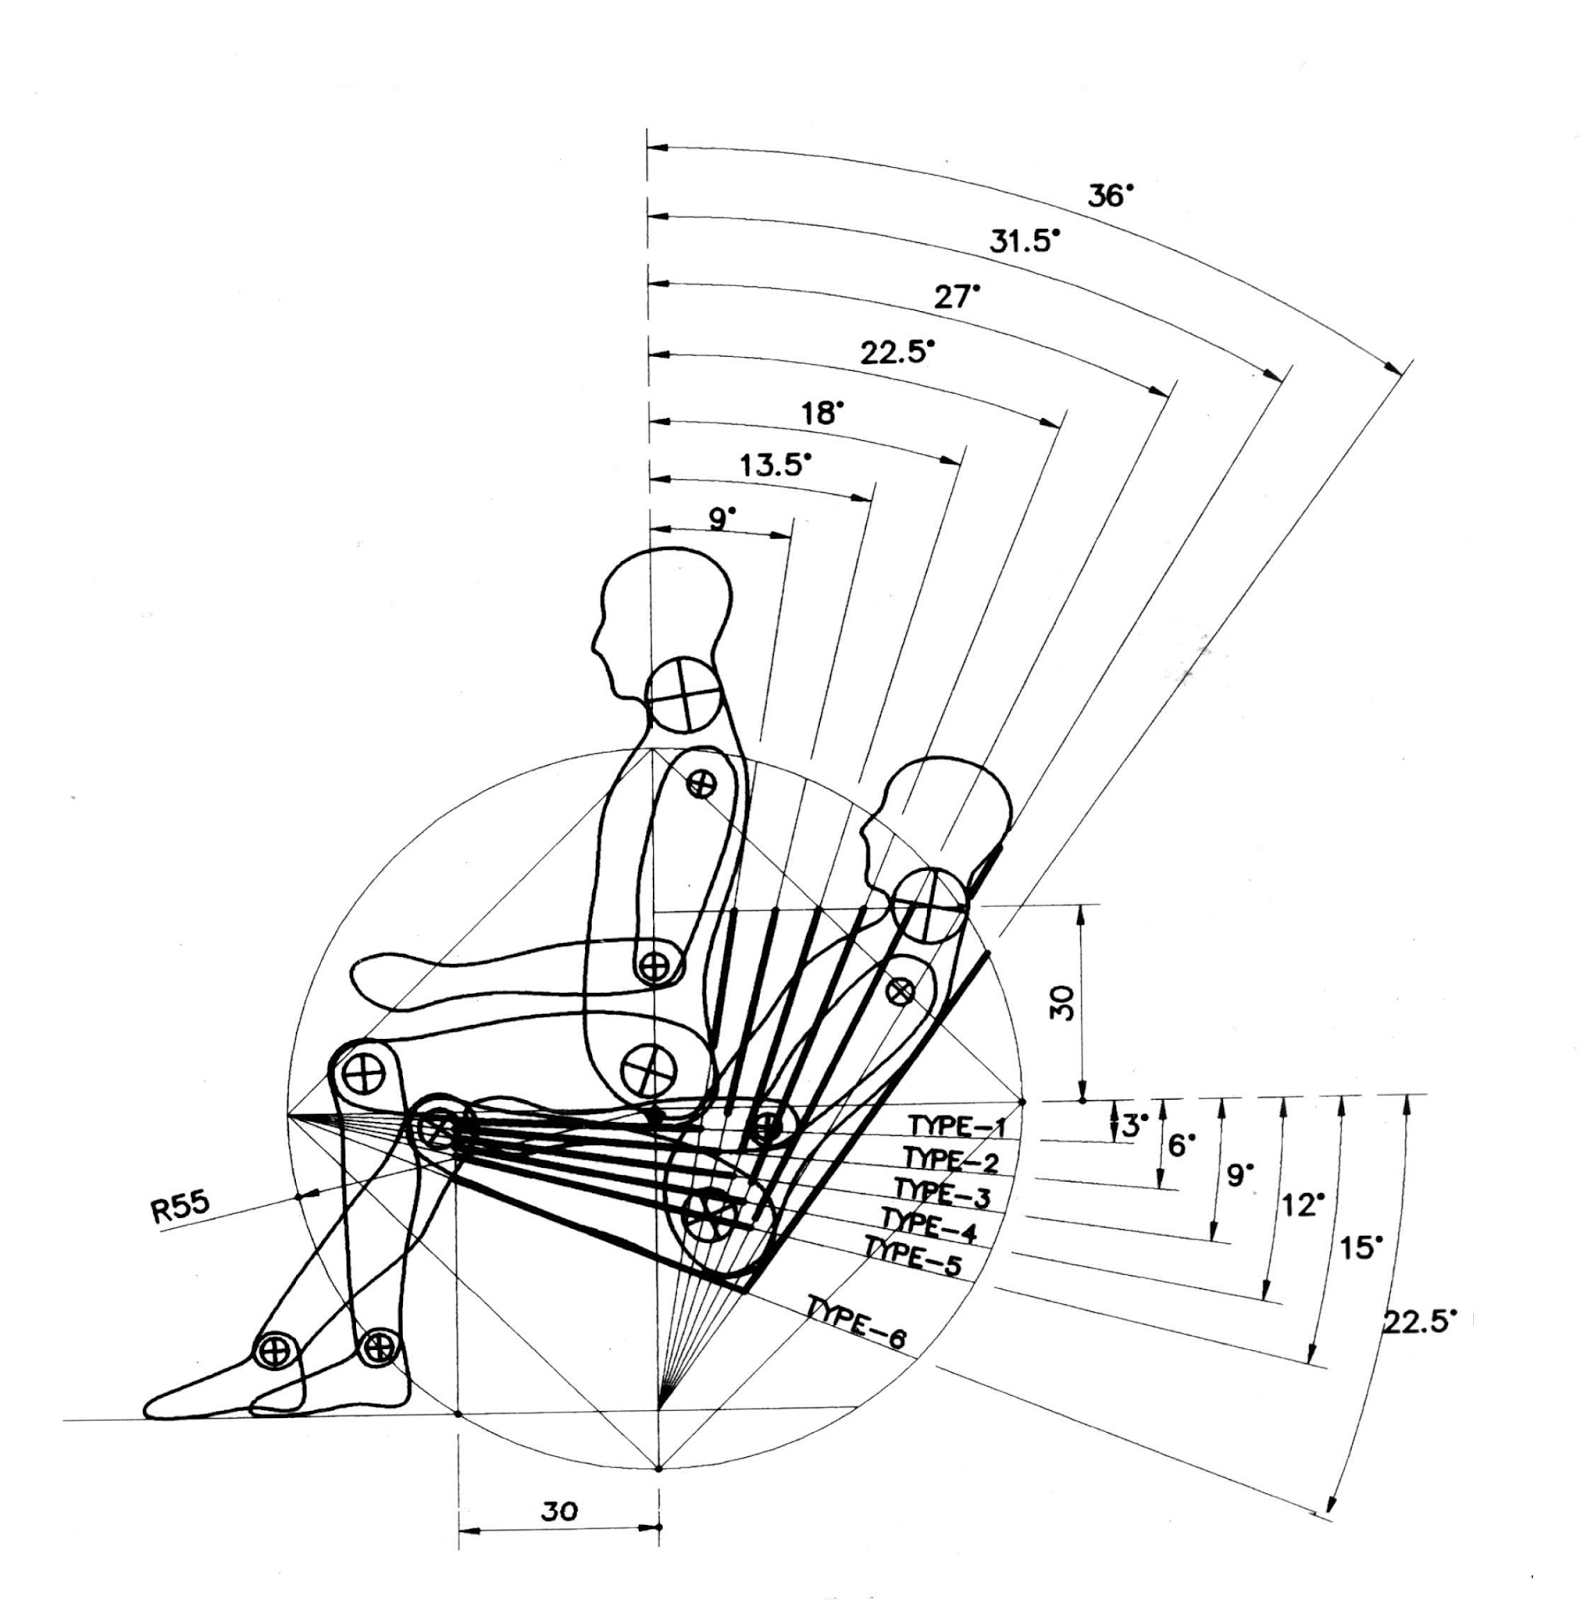 Ergonomic Chair Design Dimensions Chicco Hook On Mas Chairdesign